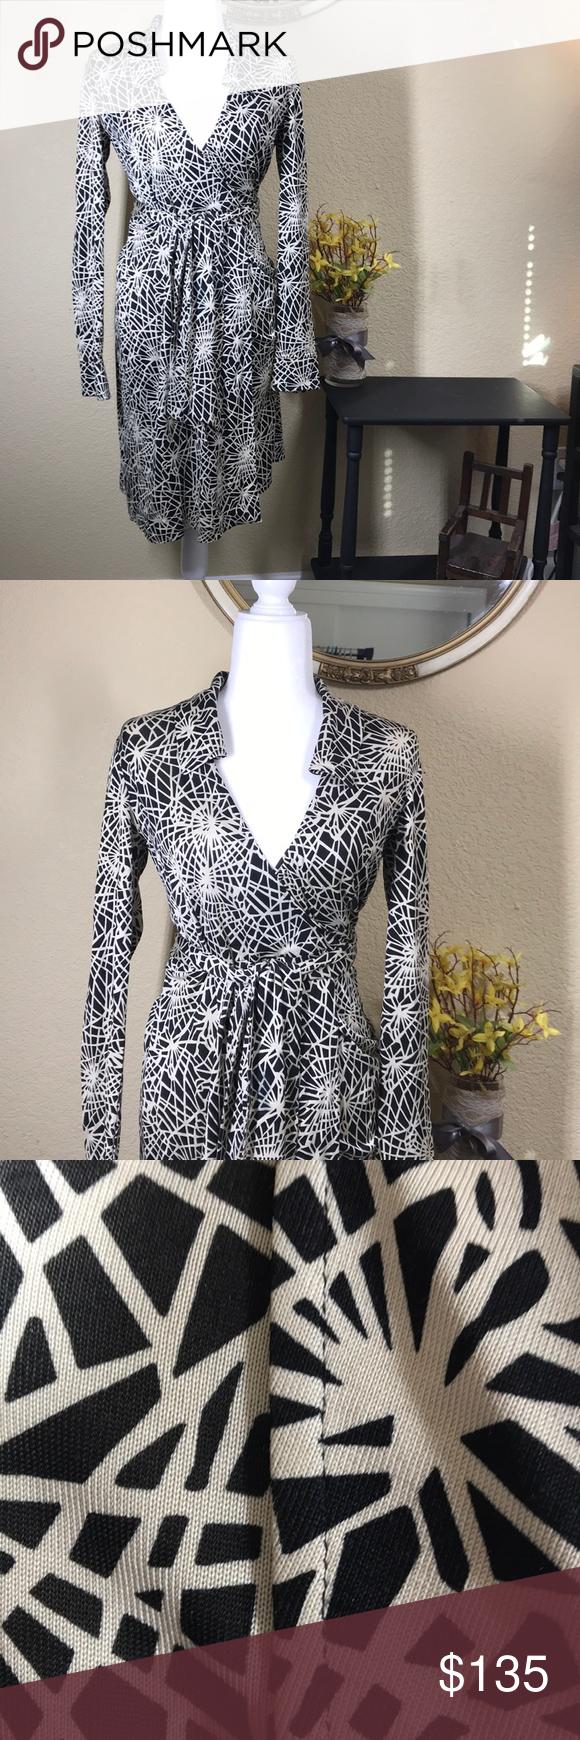 Hp Beautiful Vintage 100 Silk Dvf Wrap Dress Dvf Wrap Dress Diane Von Furstenberg Wrap Dress Wrap Dress [ 1740 x 580 Pixel ]